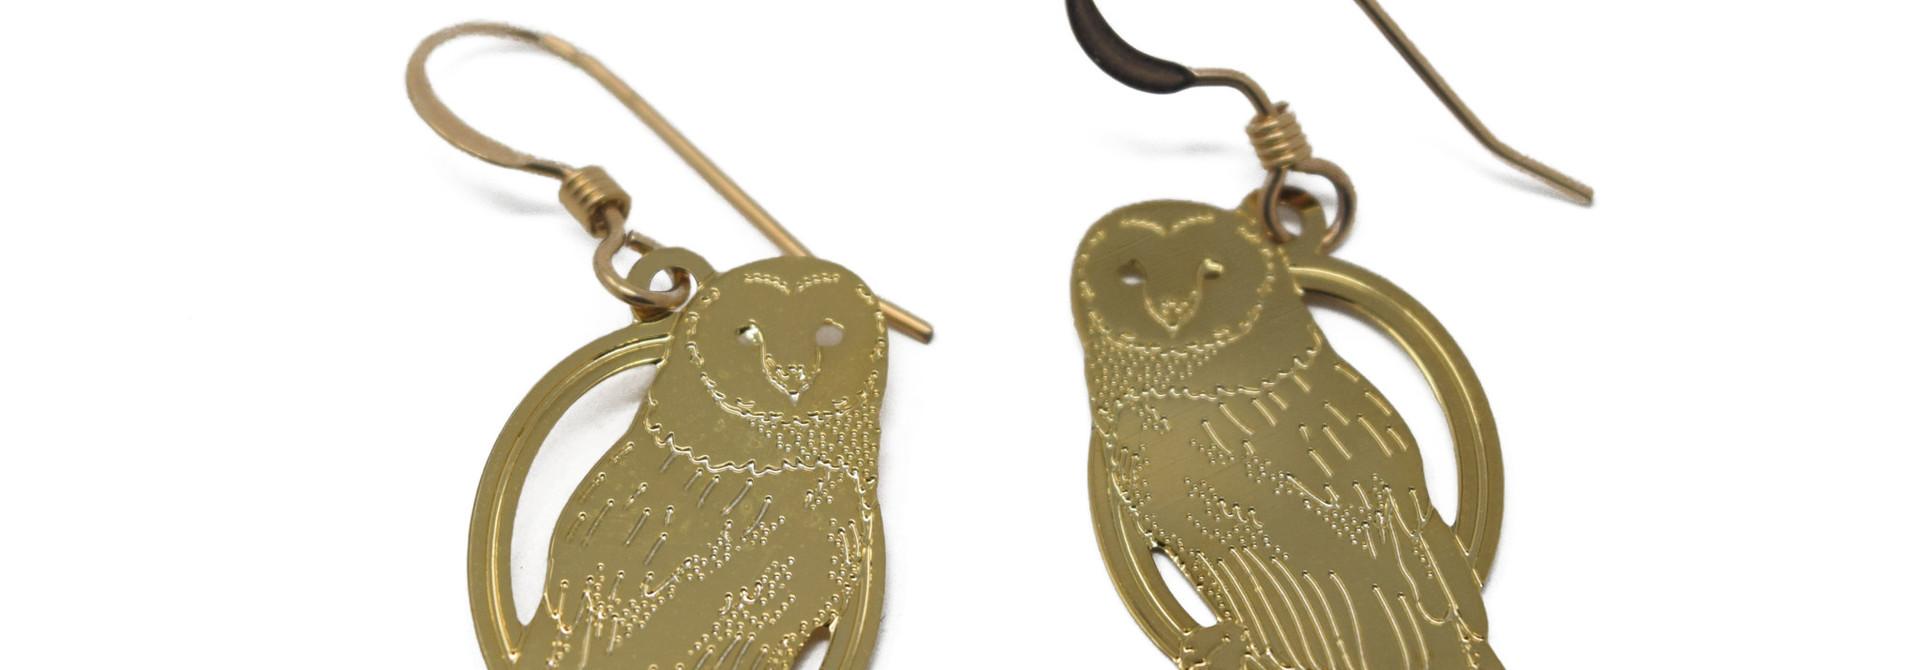 Hoot Owl Earring